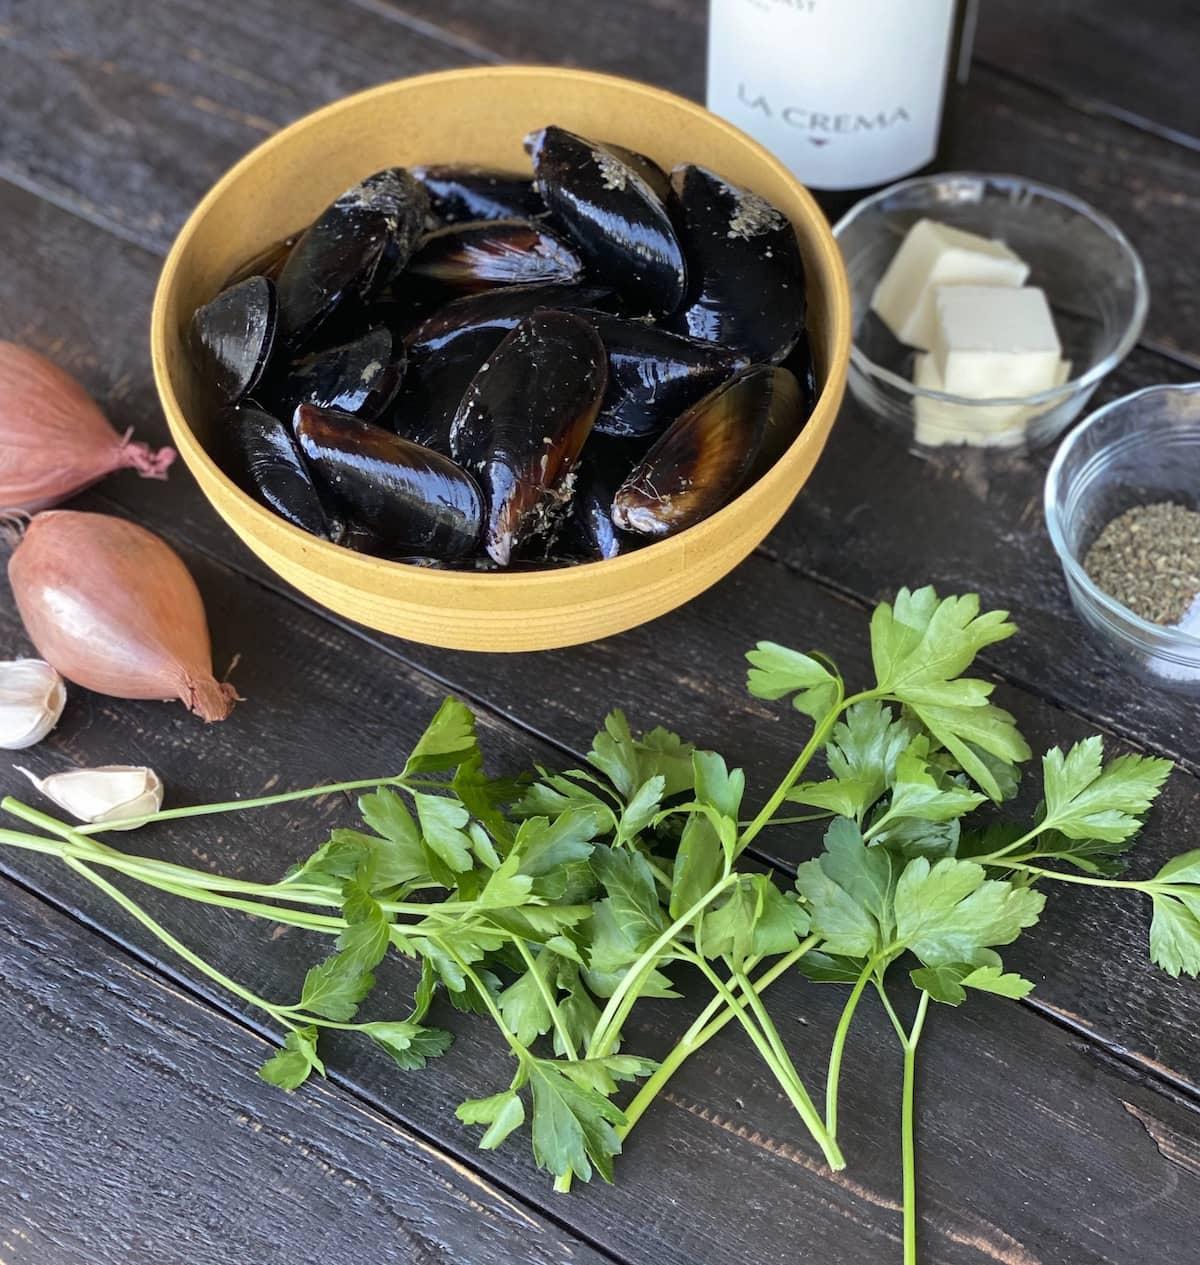 Ingredients for Drunken Mussels.